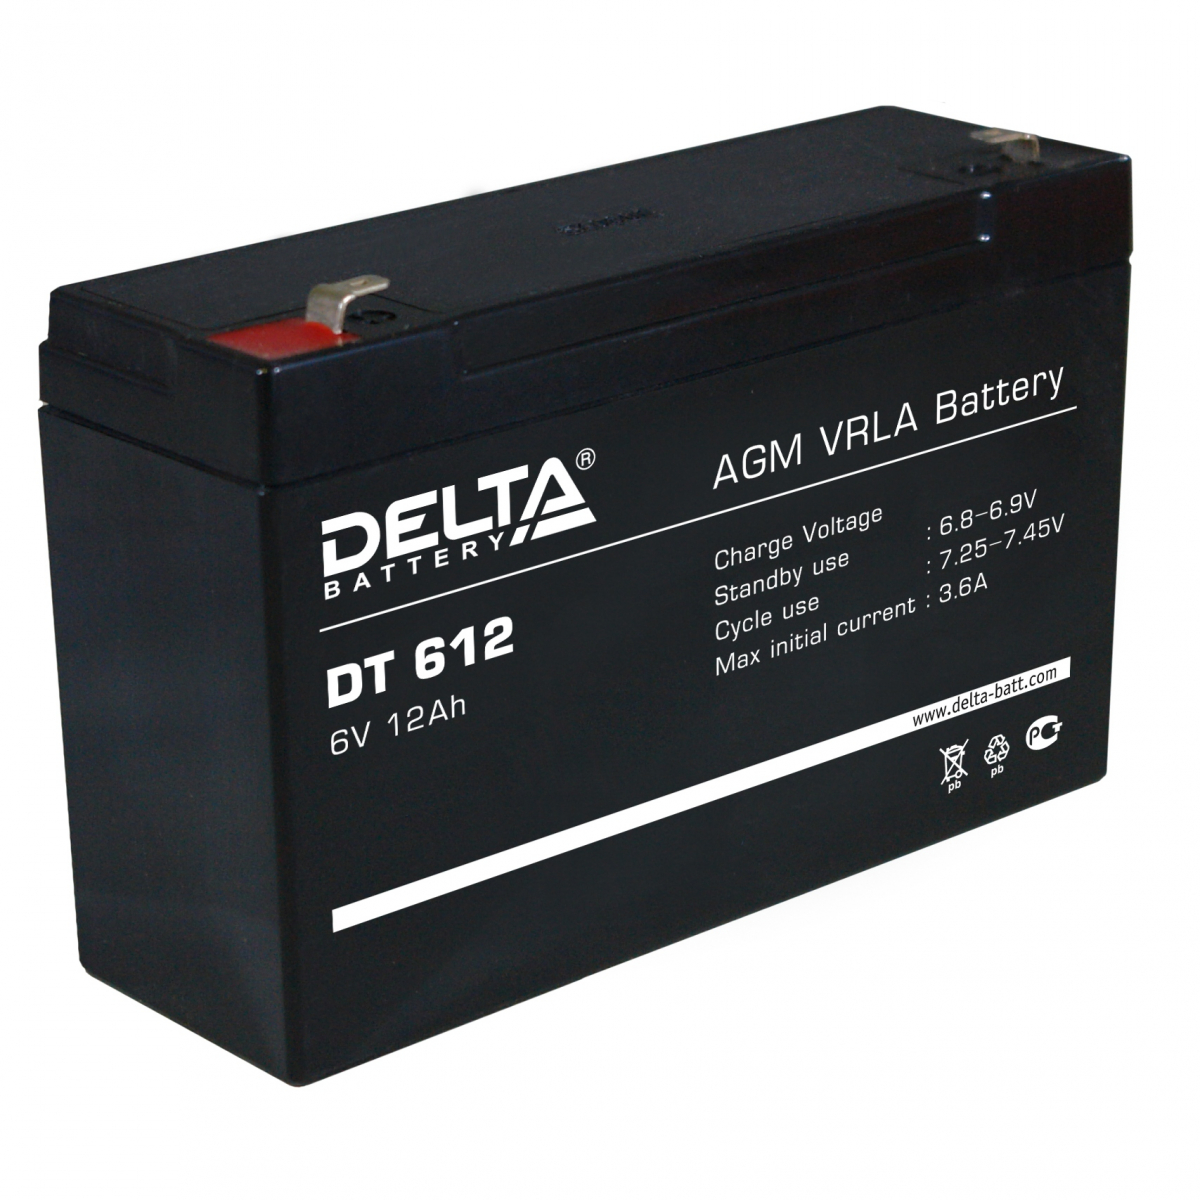 Аккумулятор для ИБП DELTA DT 612